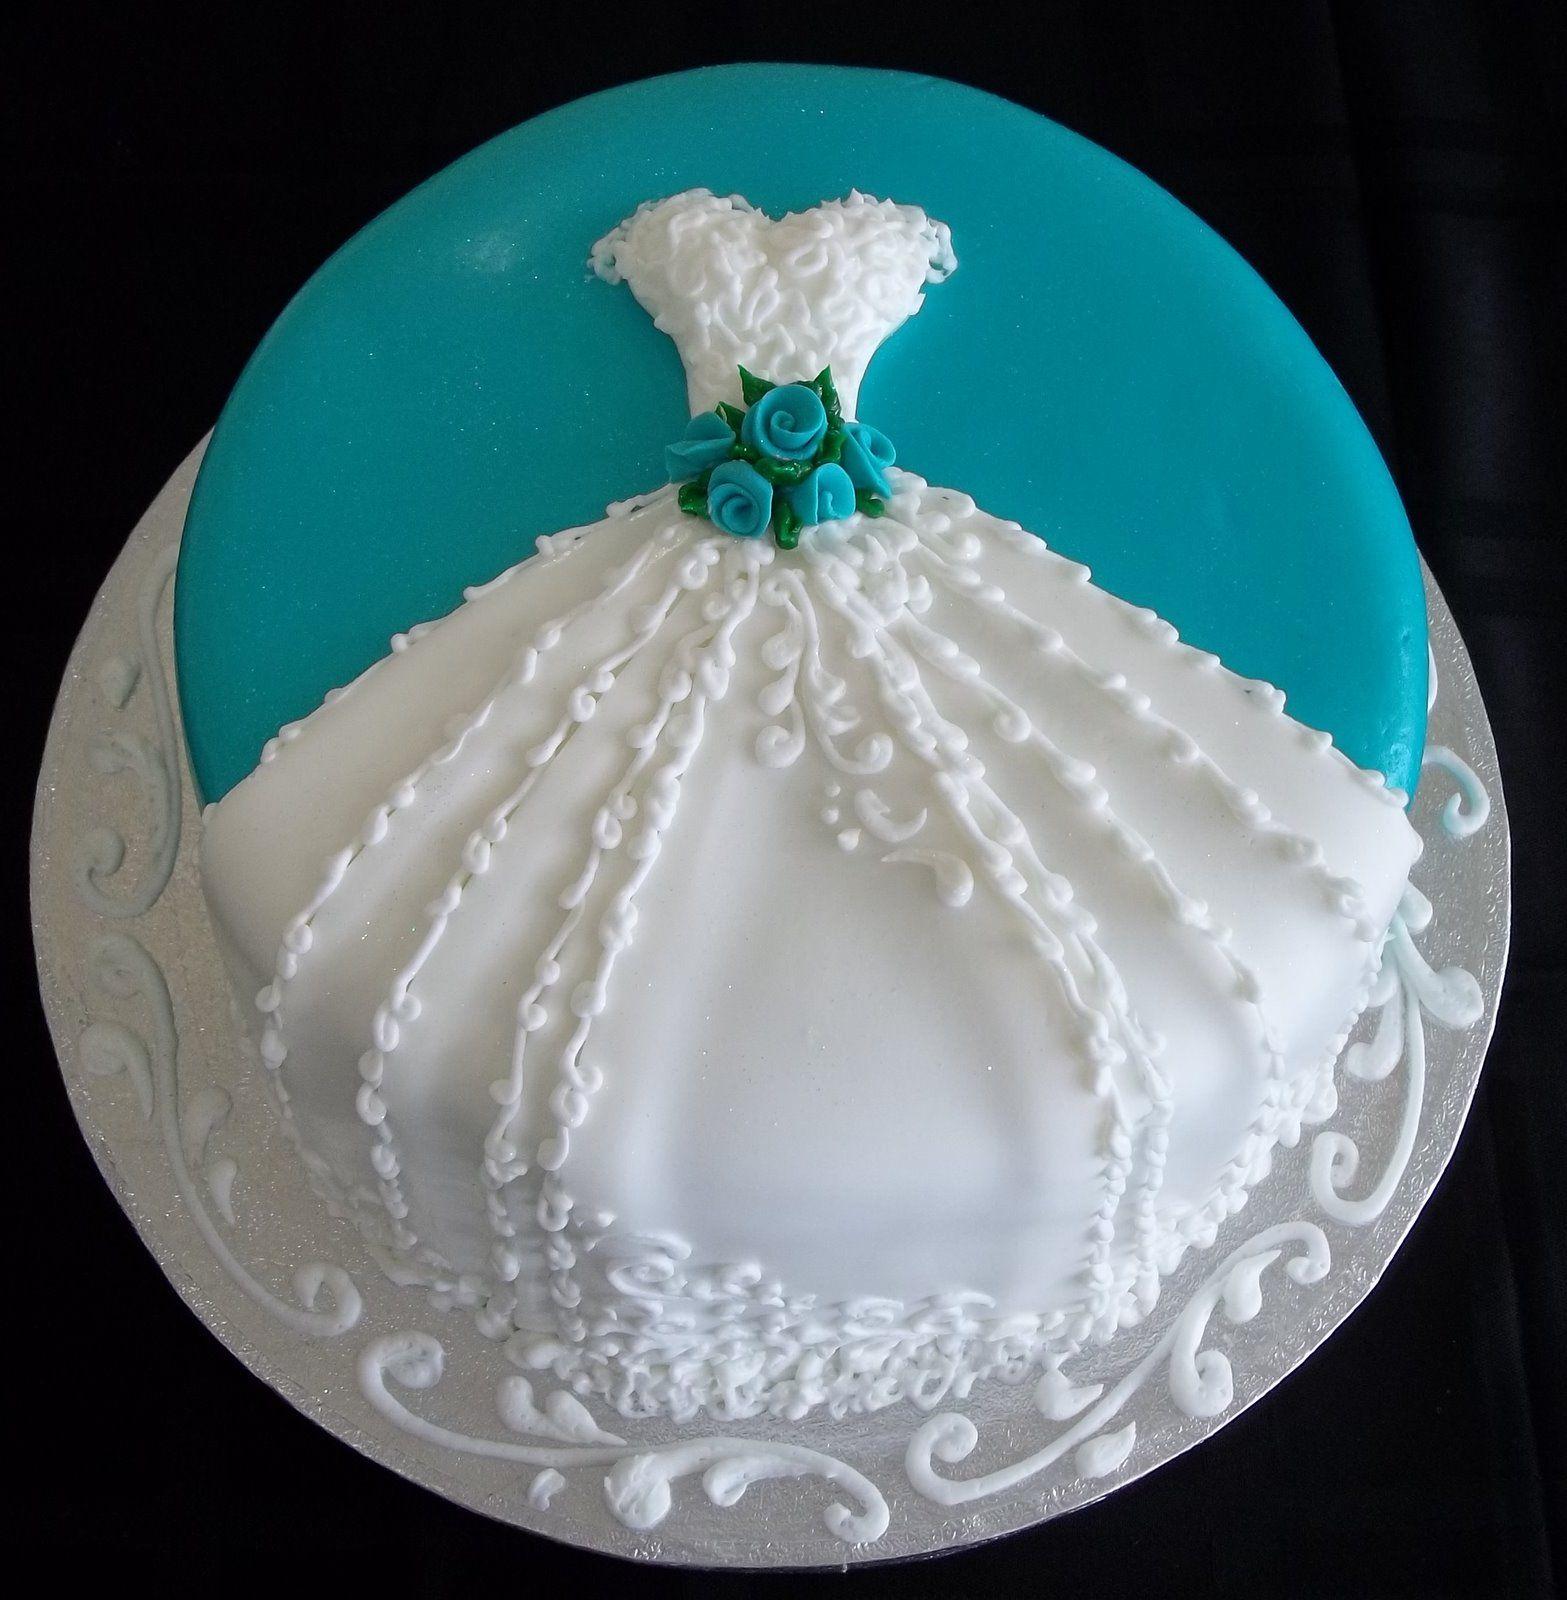 shower cake cake decoration ideas pinterest With images of wedding shower cakes